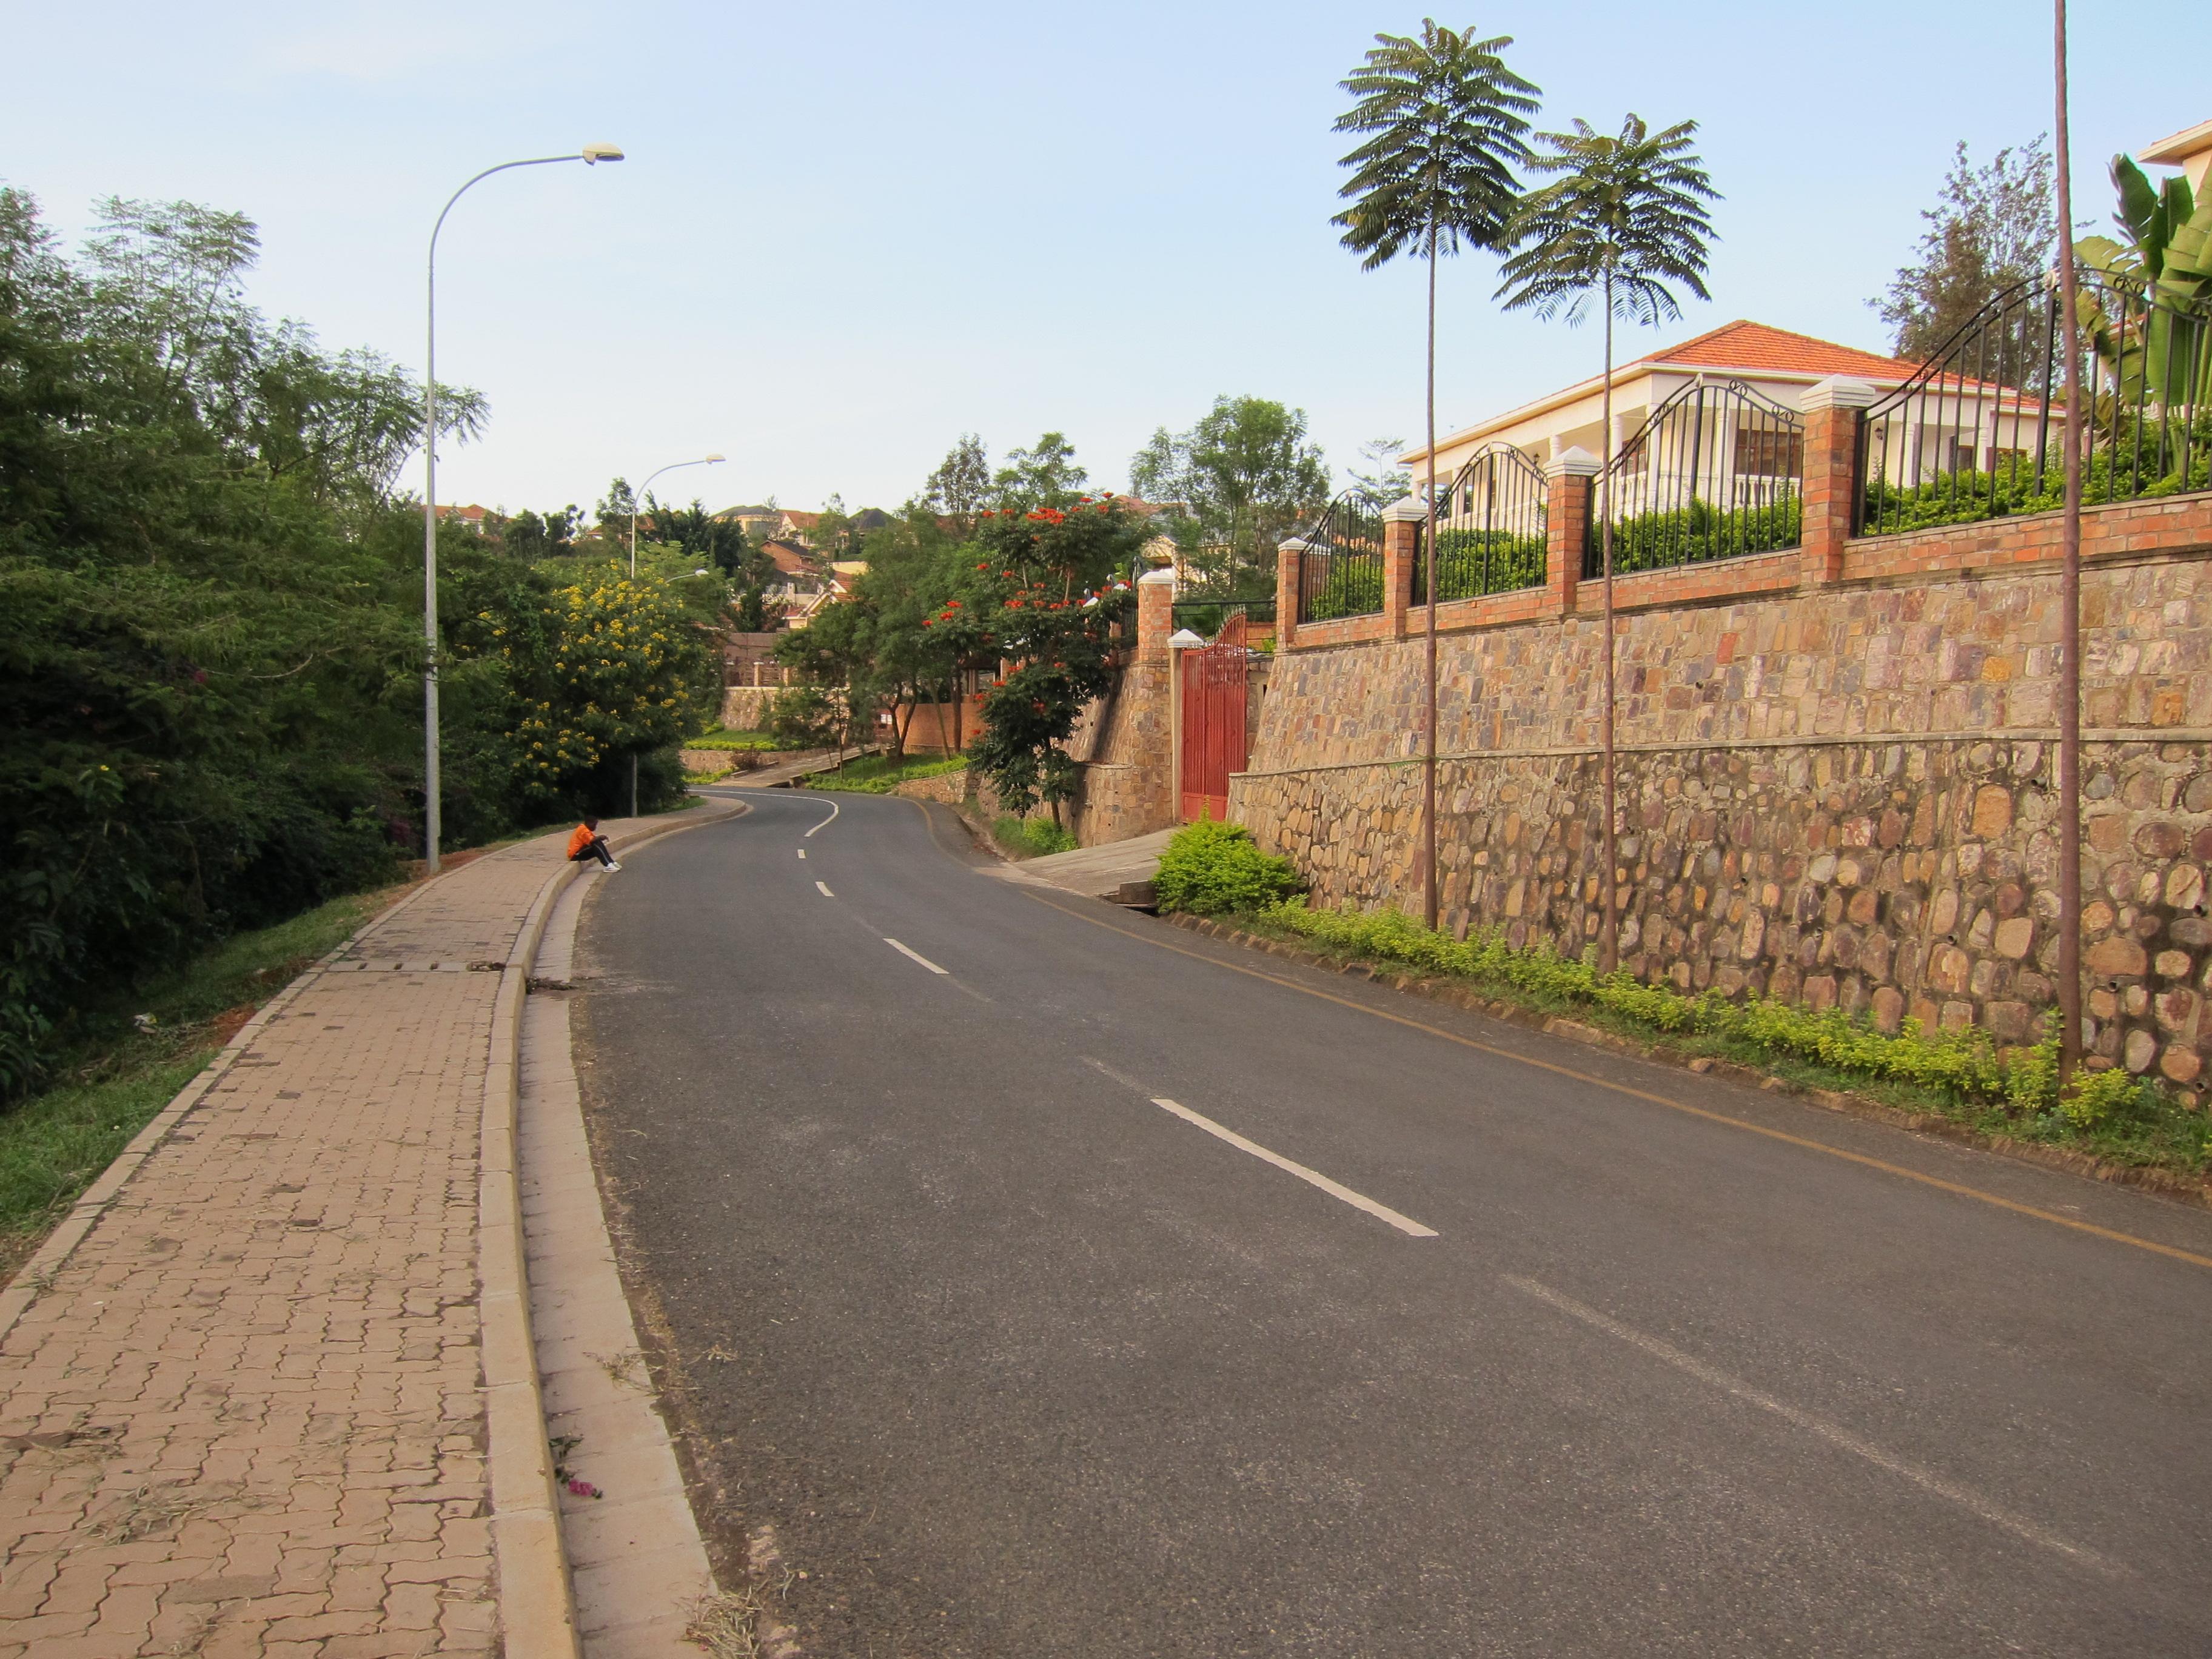 Calm street in Kigali